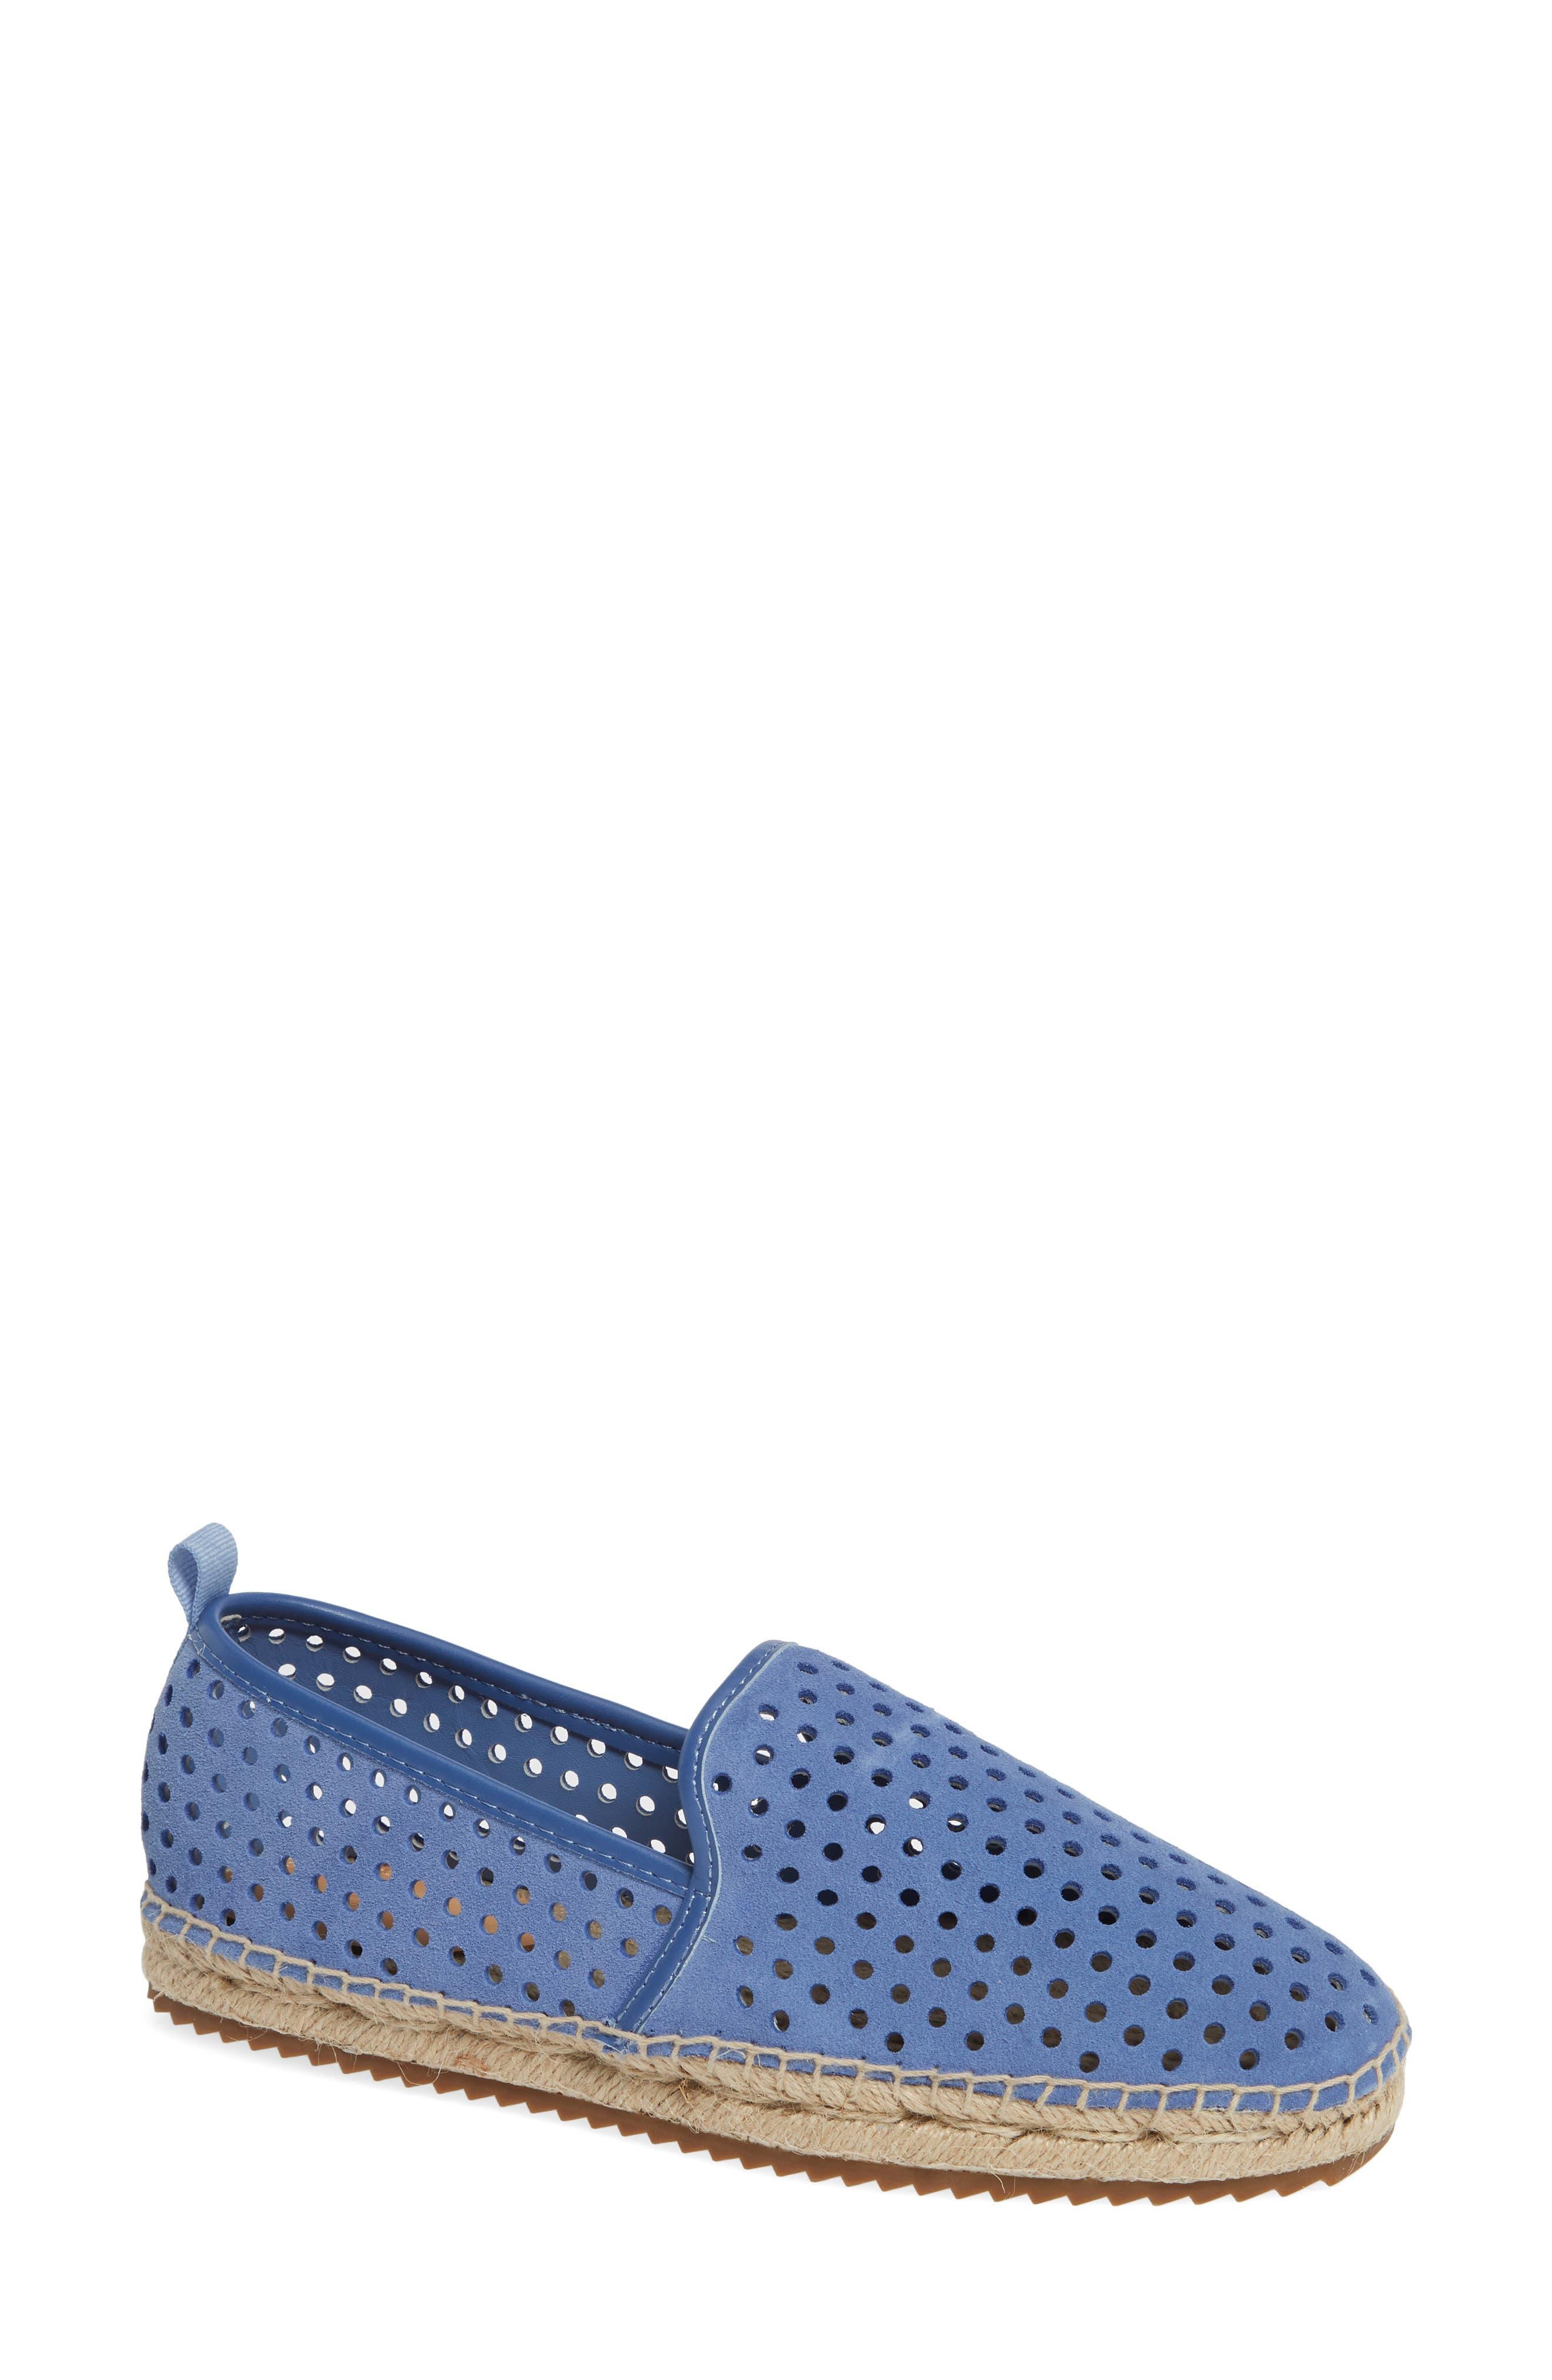 Bill Blass Sutton Perforated Espadrille Flat- Blue